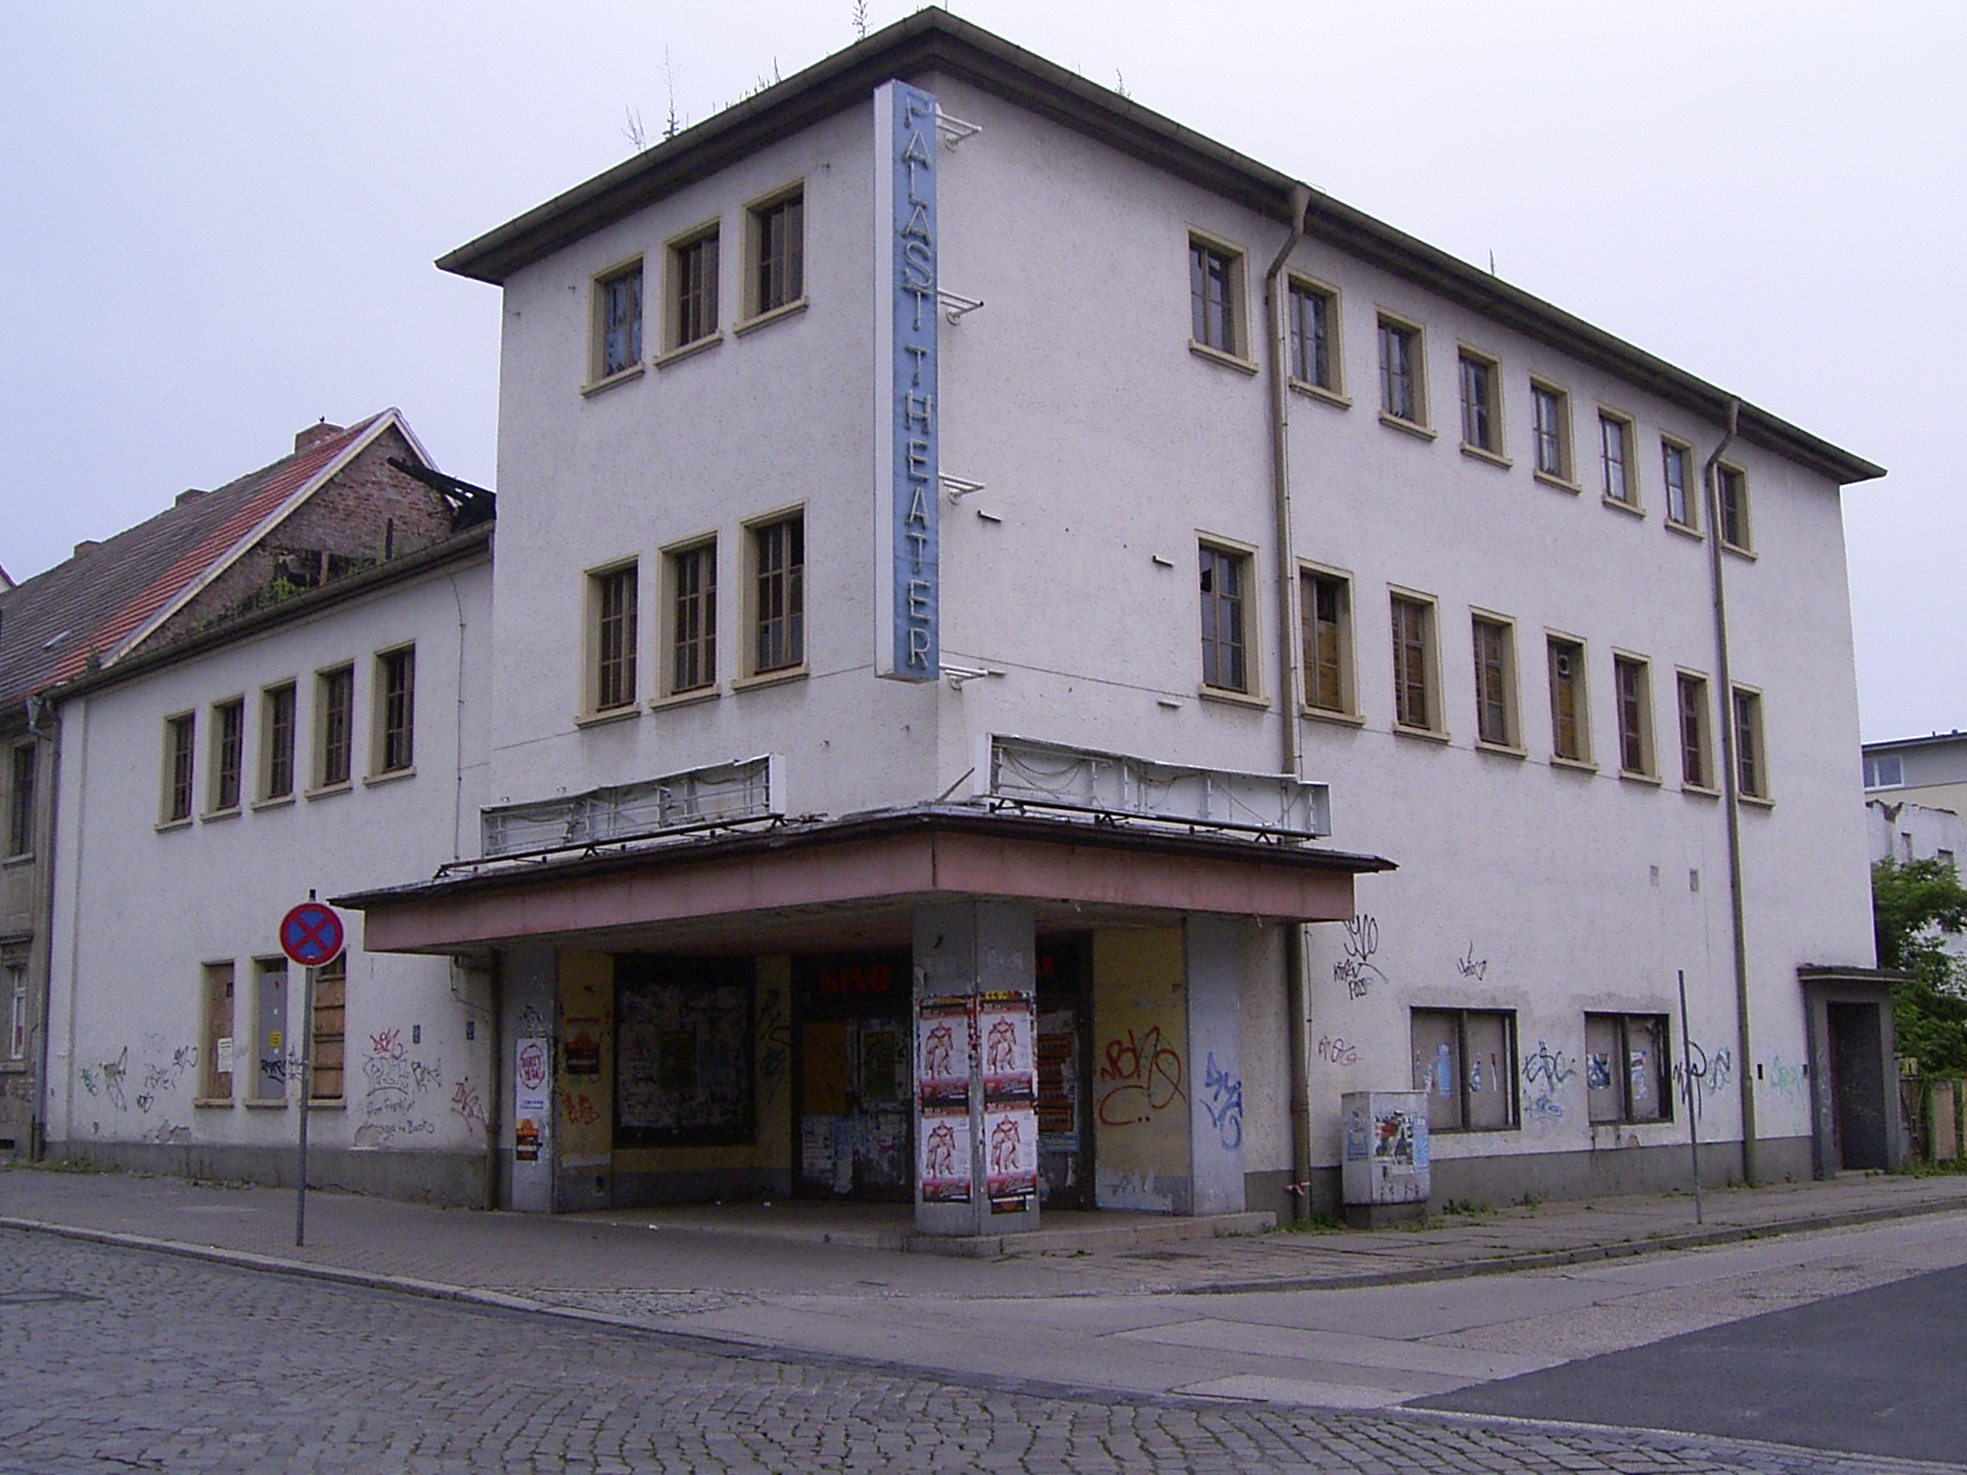 Kino Dessau-Roßlau